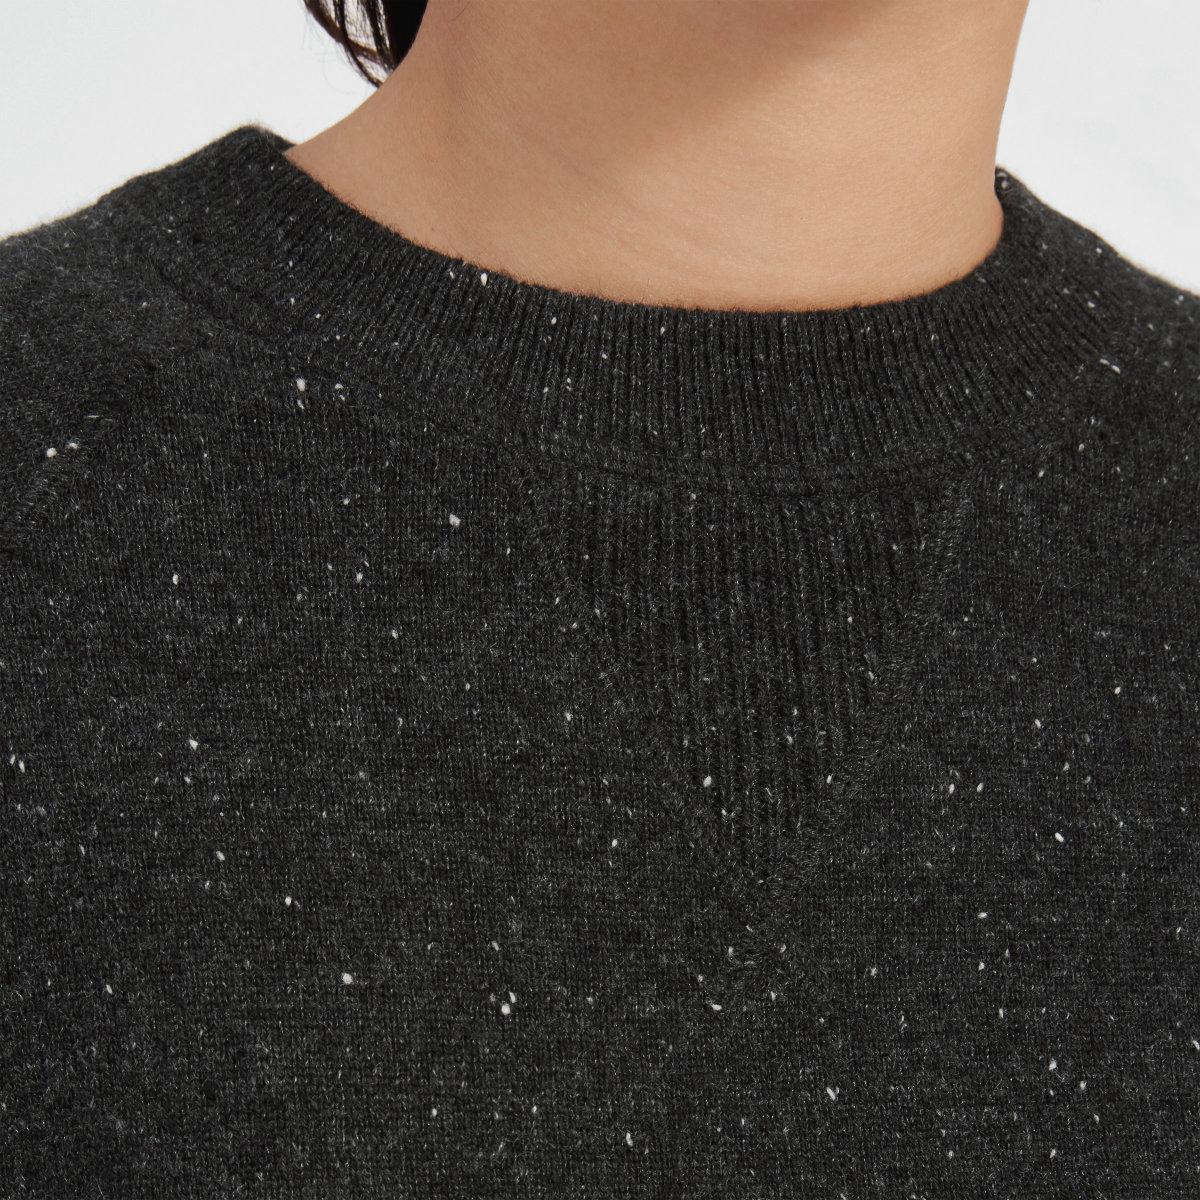 5da2a563d3 Women's Cashmere Shrunken Sweatshirt | Everlane